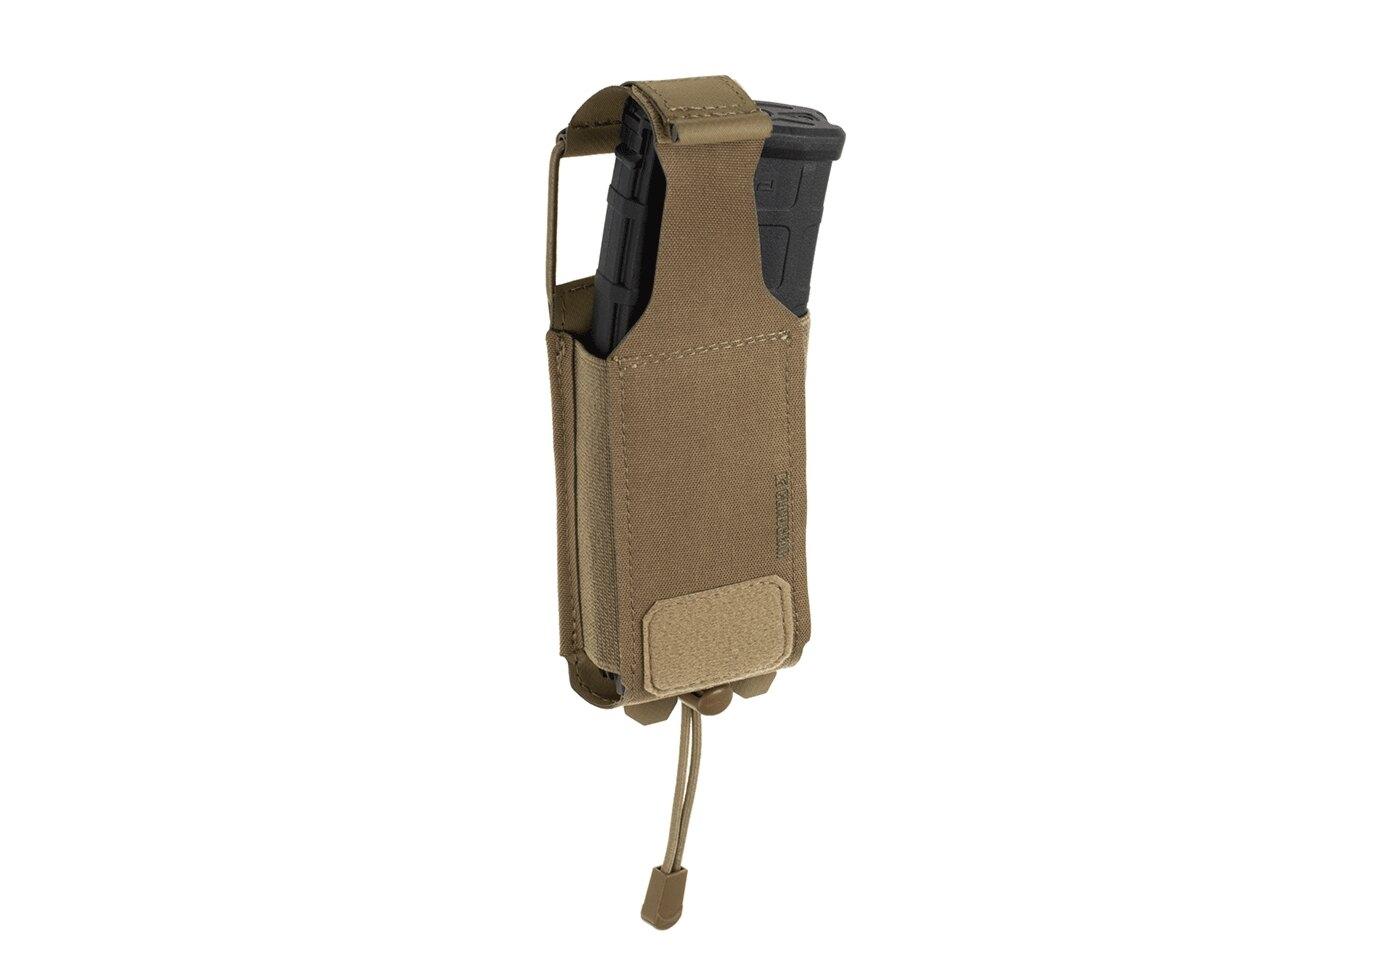 Sumka na zásobník 5,56 mm CLAWGEAR® - coyote (Farba: Coyote)